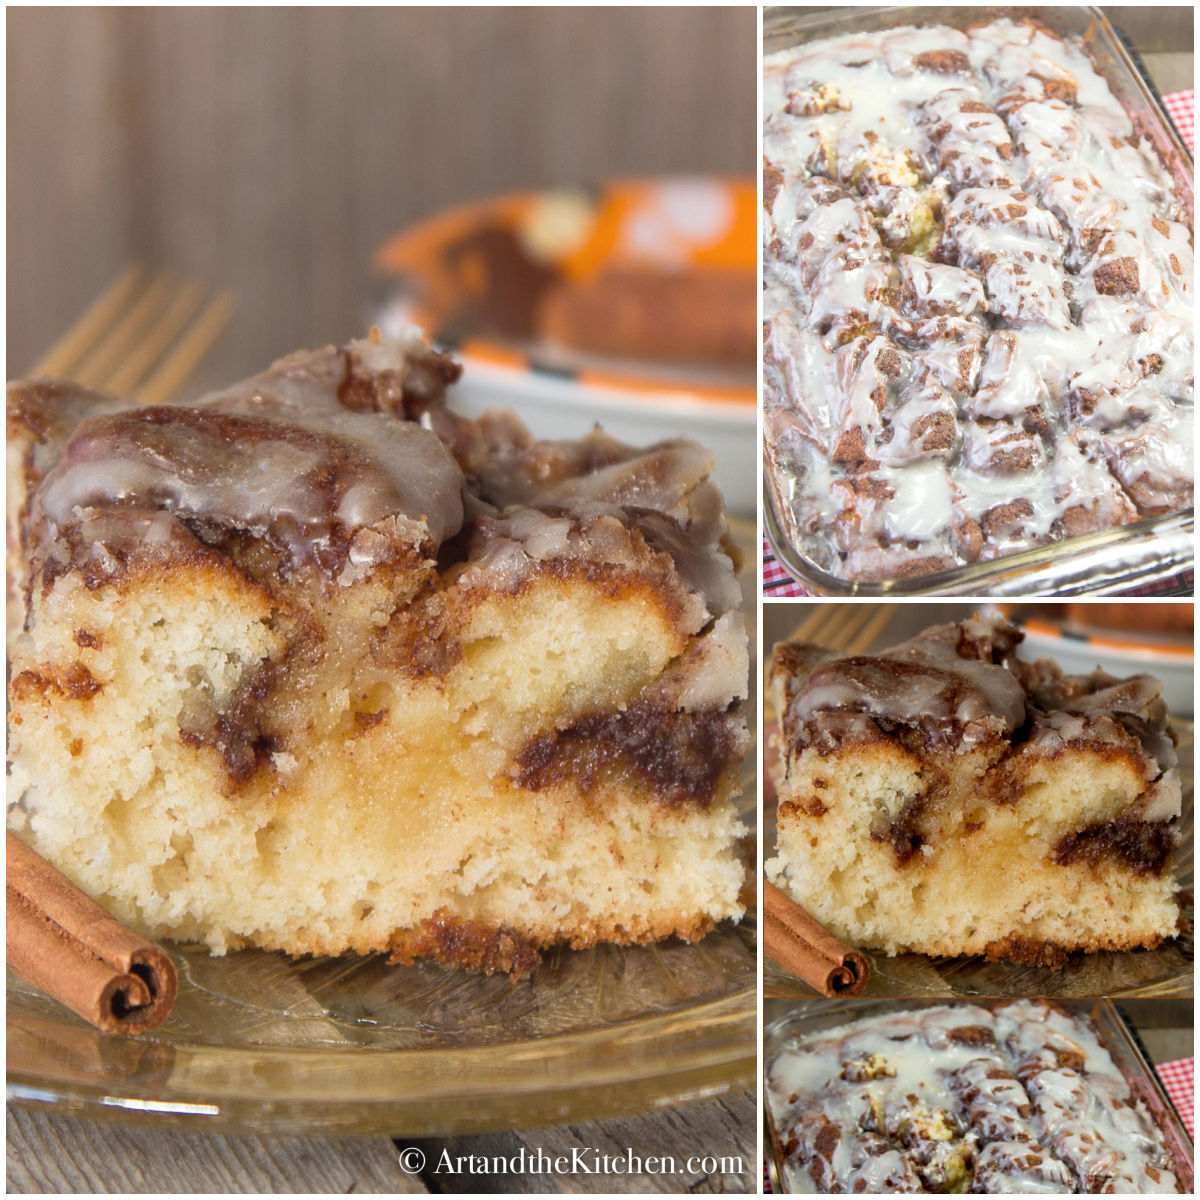 Cinnamon Roll Swirl Cake  tastes like a homemade cinnamon bun without all the work. A great coffee cake recipe! via @artandthekitch